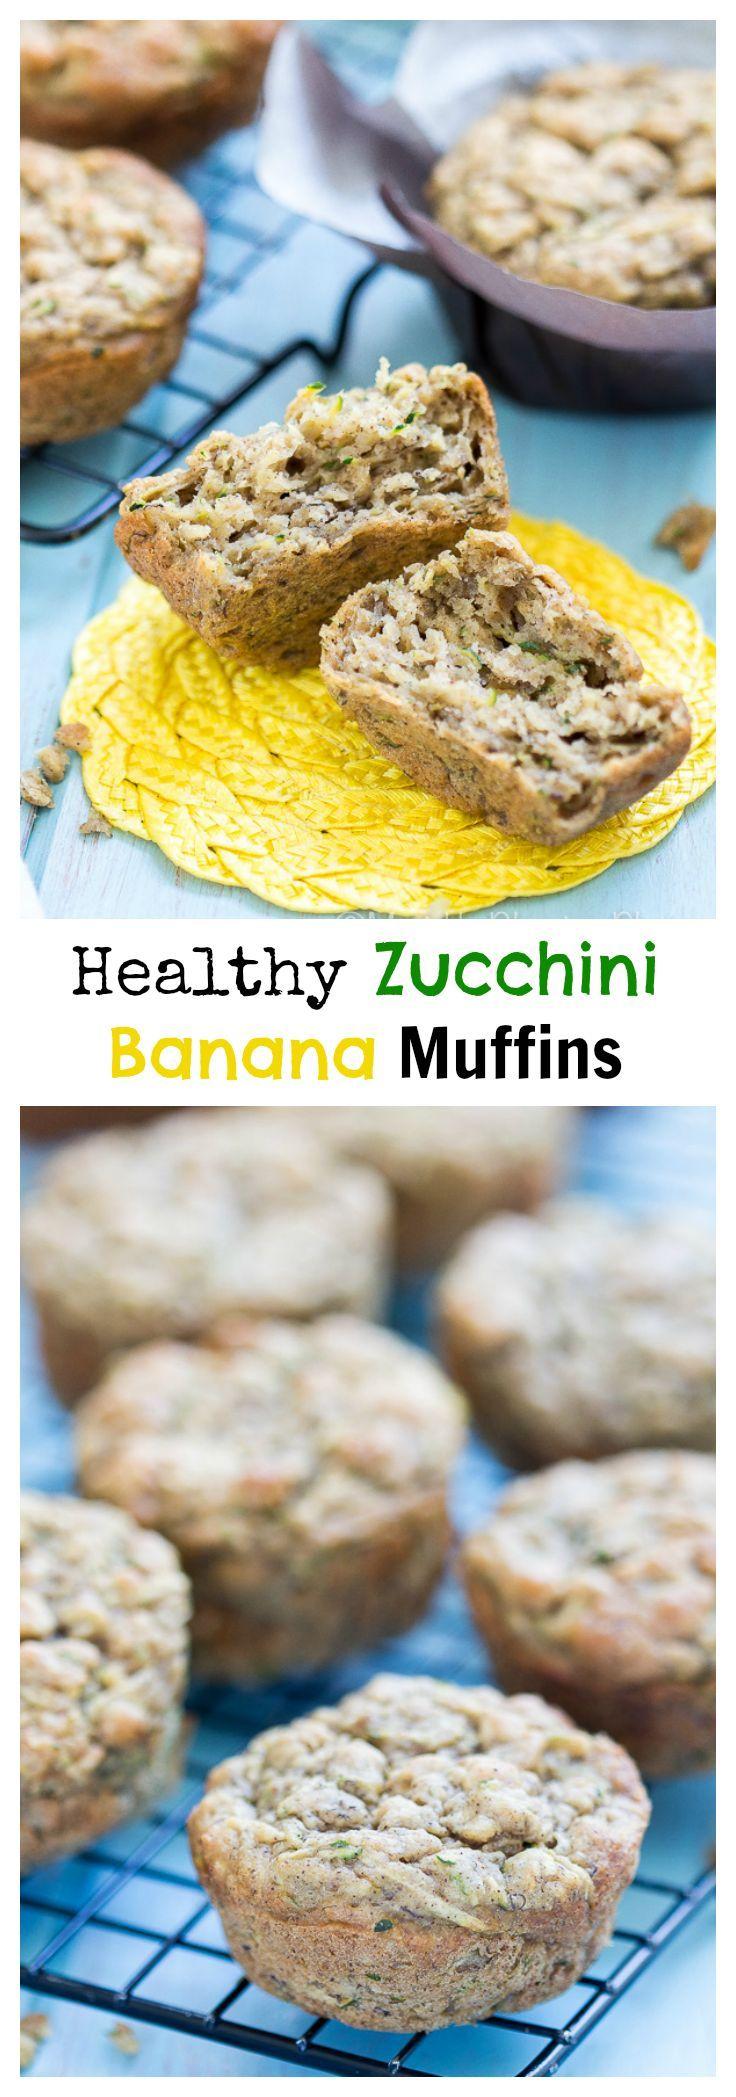 recipe: banana muffins with greek yogurt and coconut oil [27]